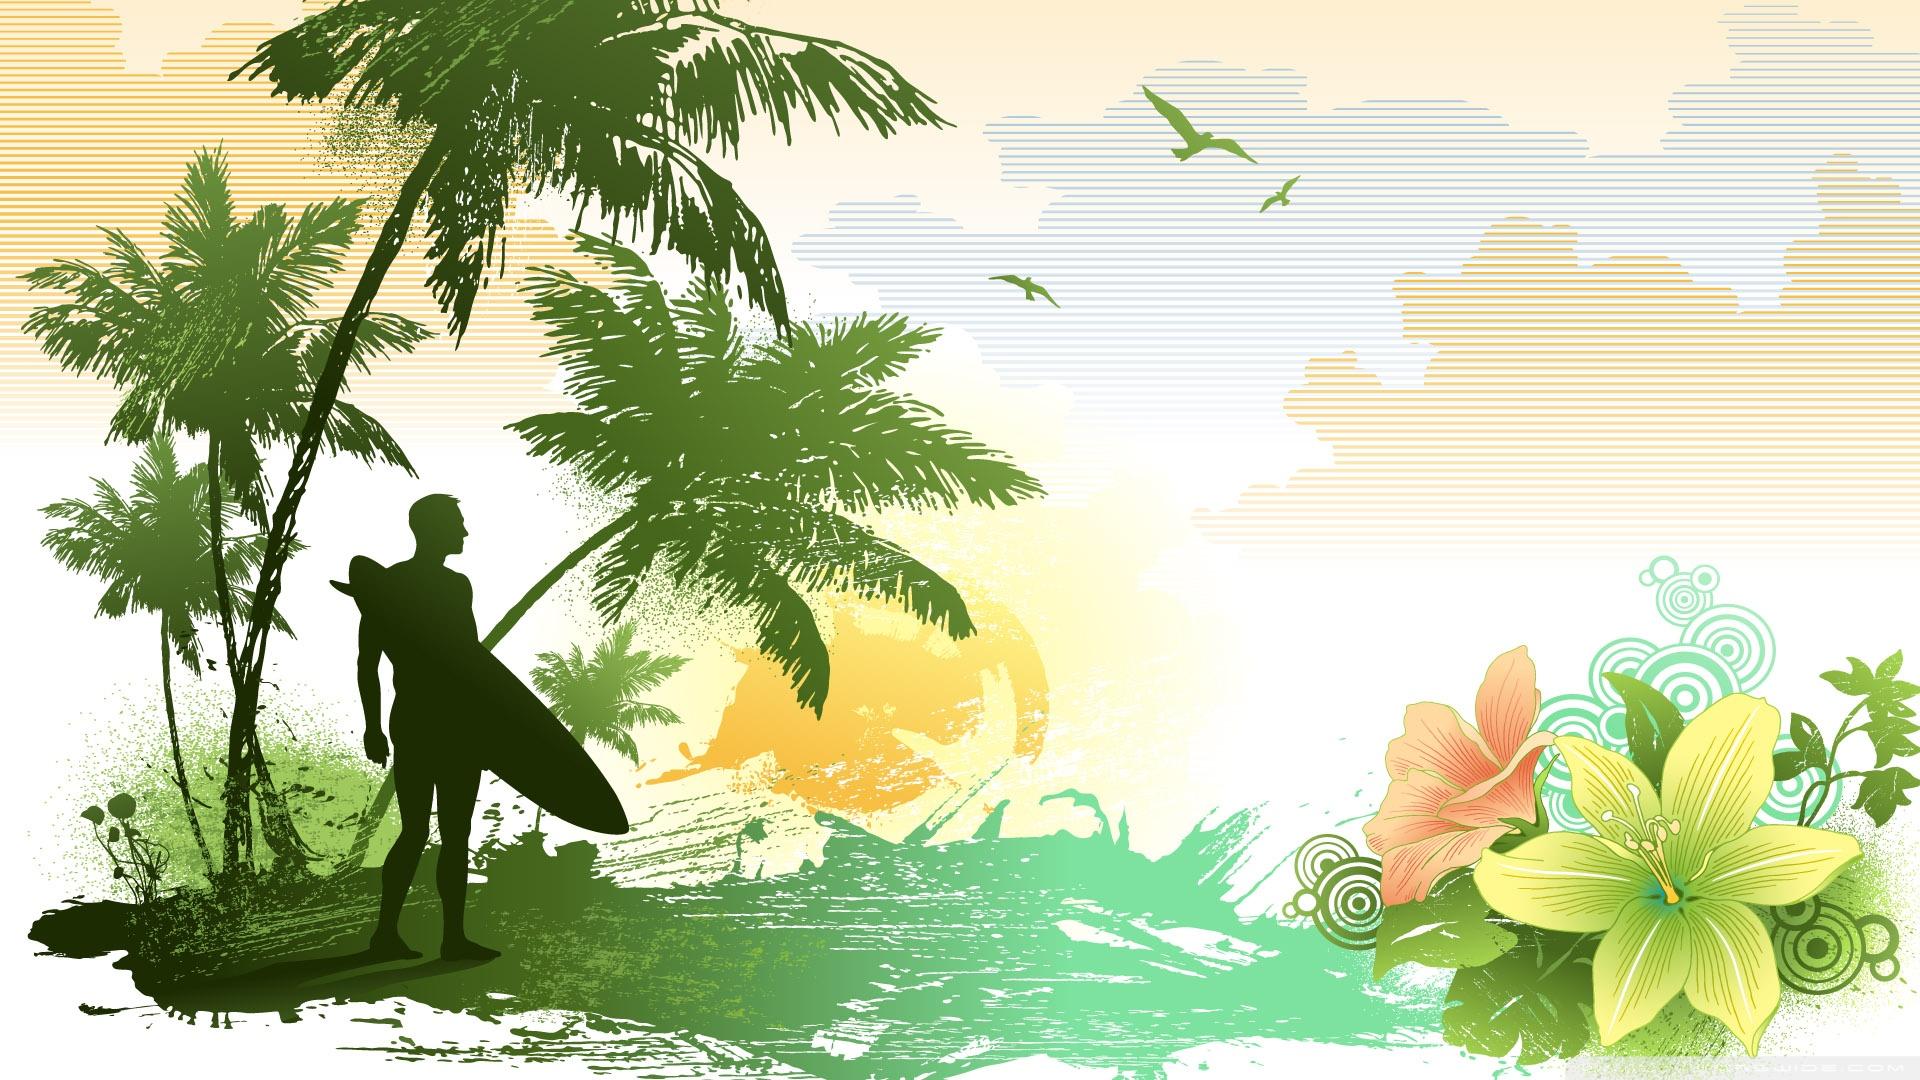 Surfing HD Wallpaper - Wallpaper, High Definition, High Quality ...